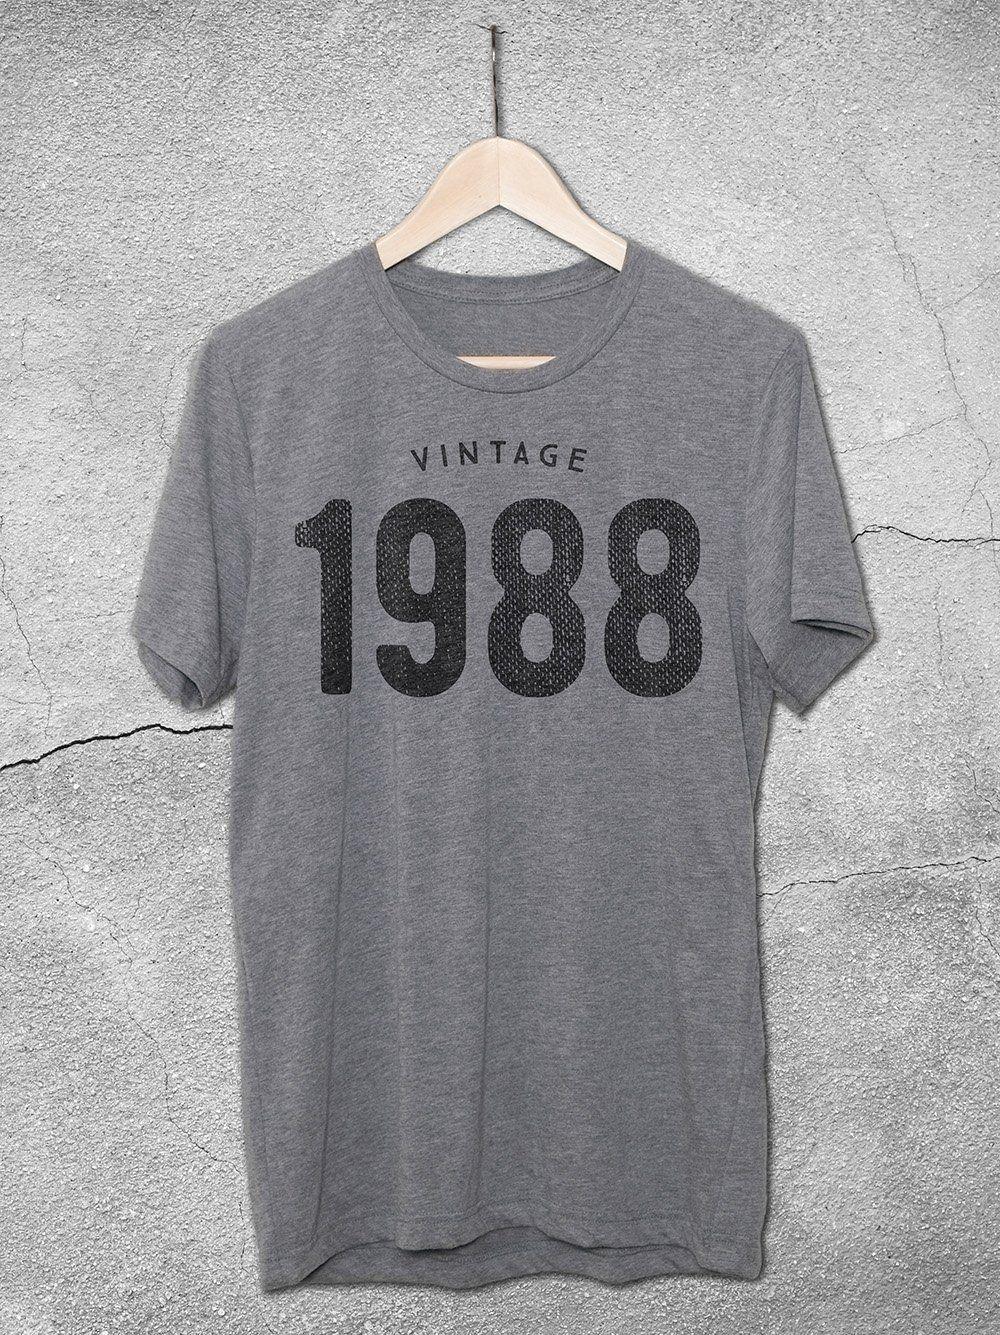 38ceaa739 1987 T-Shirt | B I R T H D A Y | 30th birthday shirts, Shirts ...